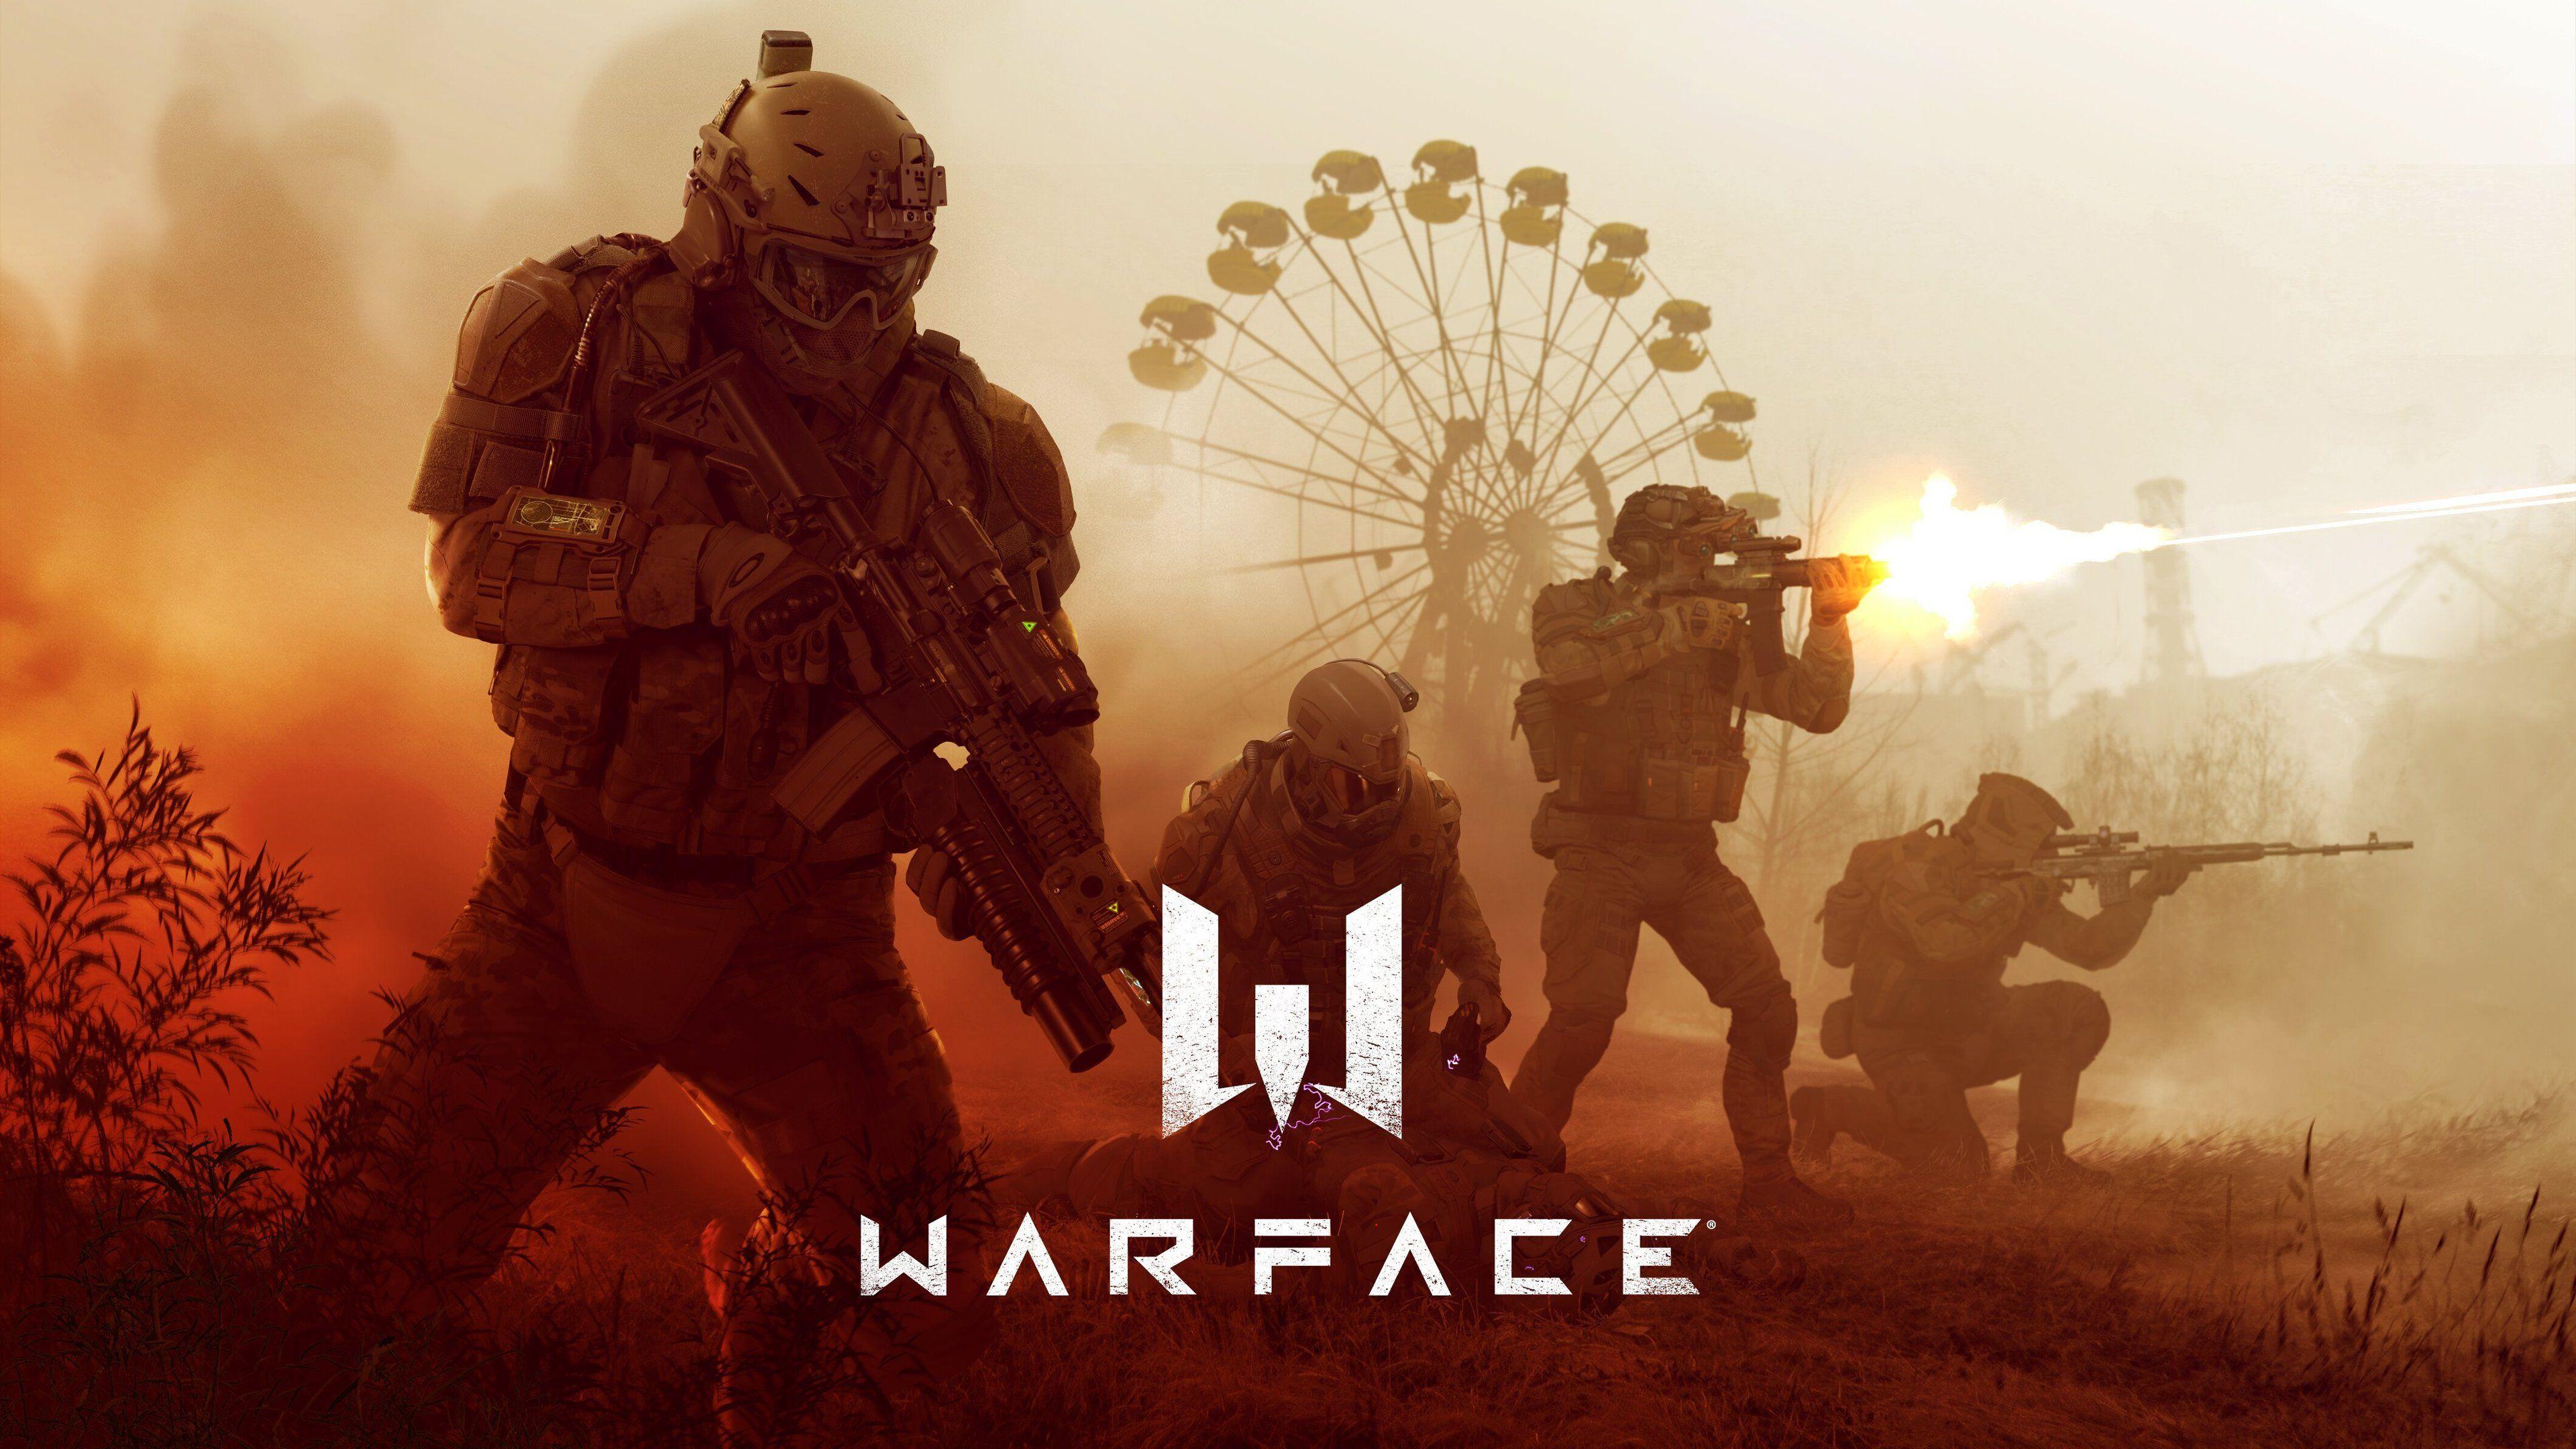 Warface 2018 4k warface wallpapers, hd-wallpapers, games wallpapers